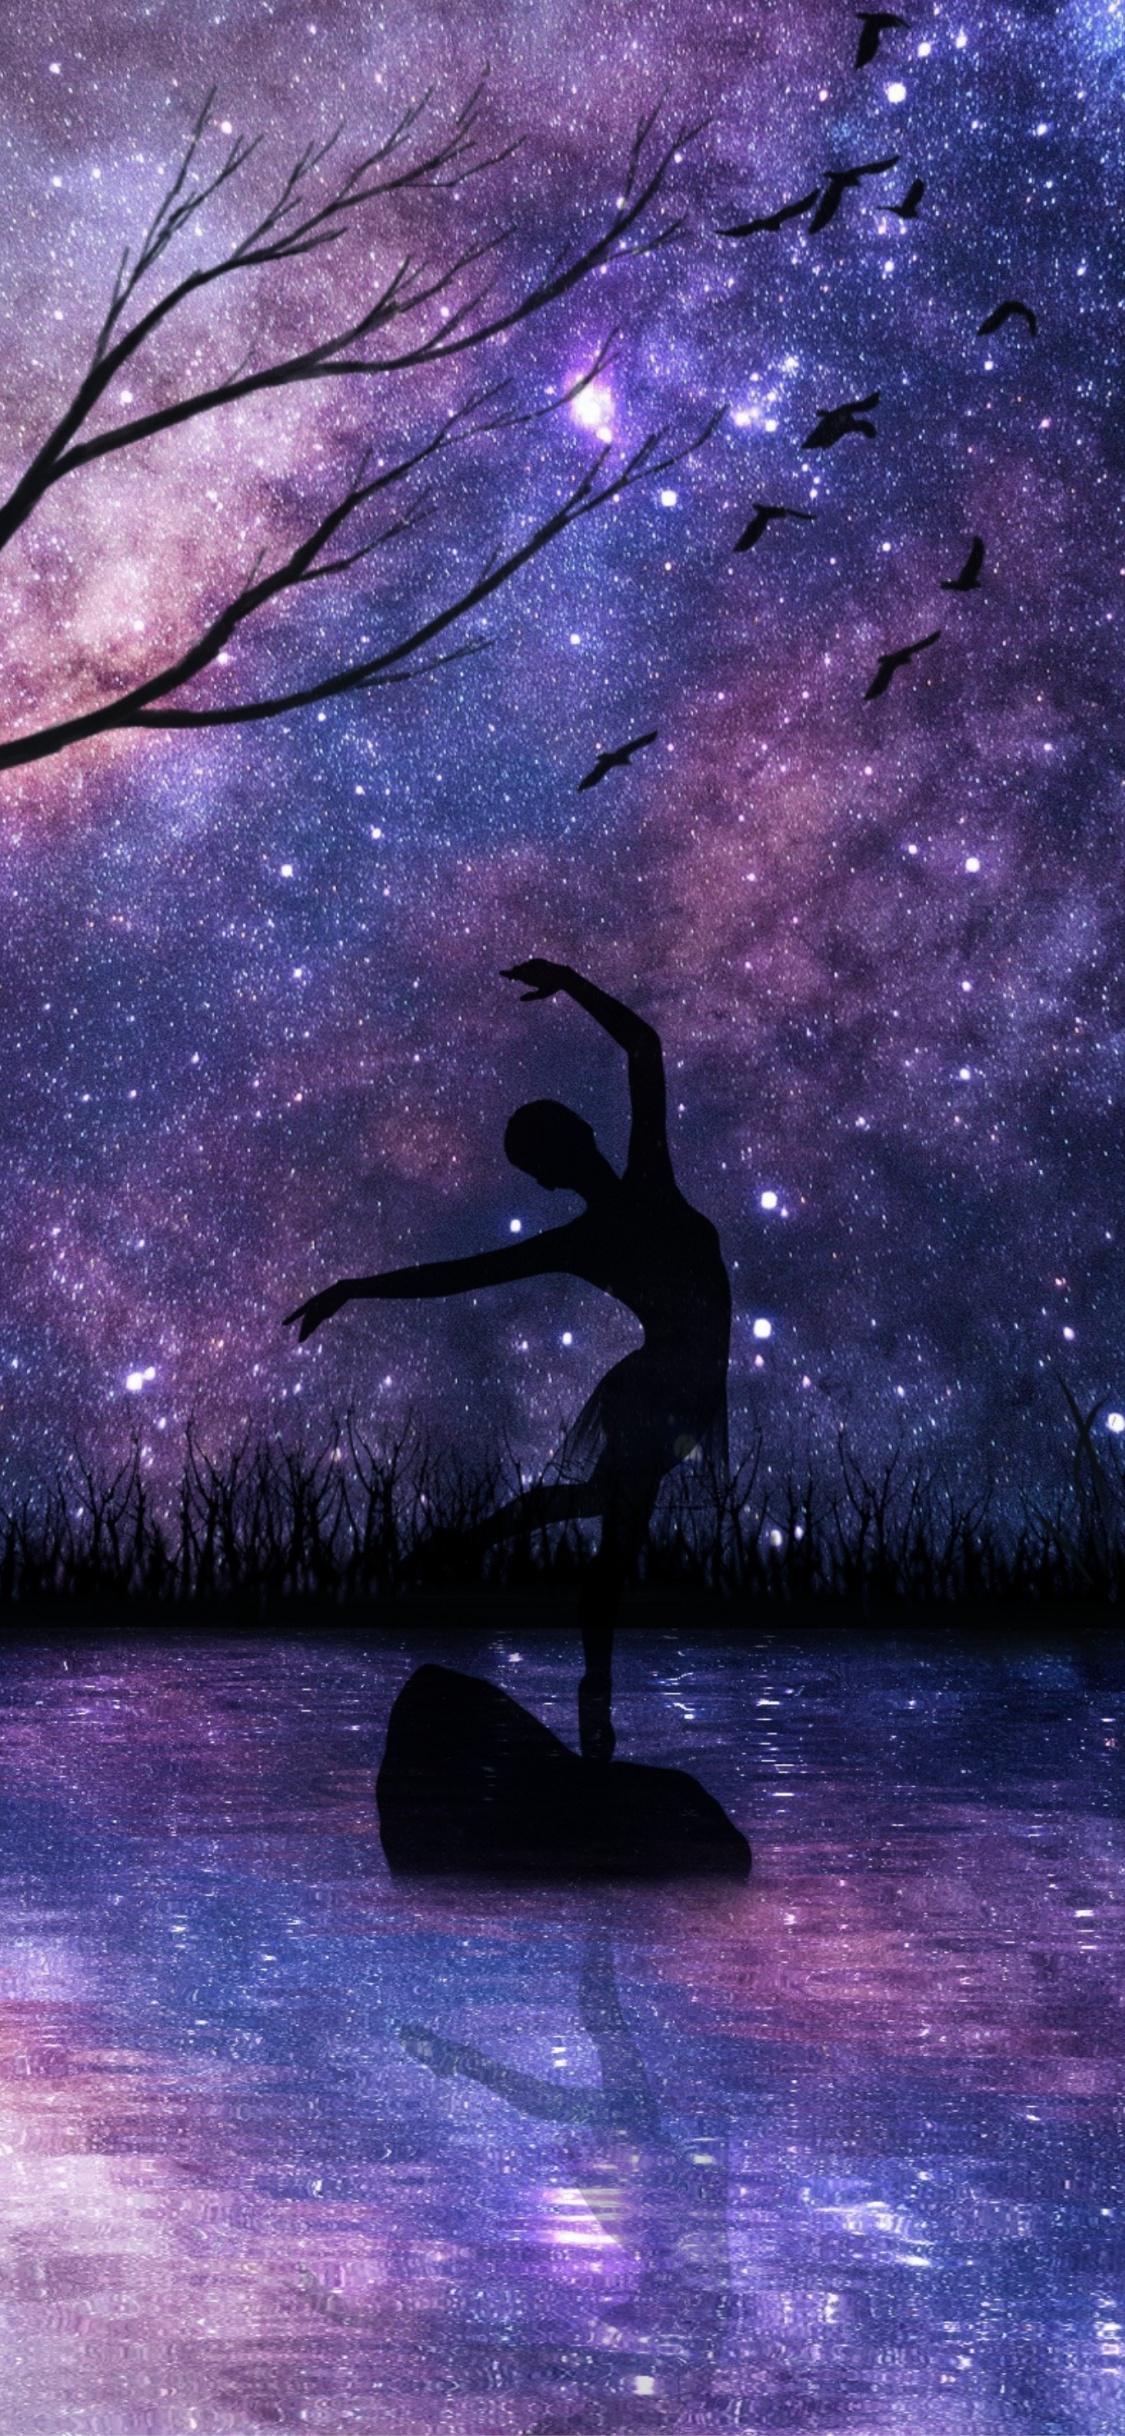 Dance Wallpaper For Iphone 1125x2436 Wallpaper Teahub Io